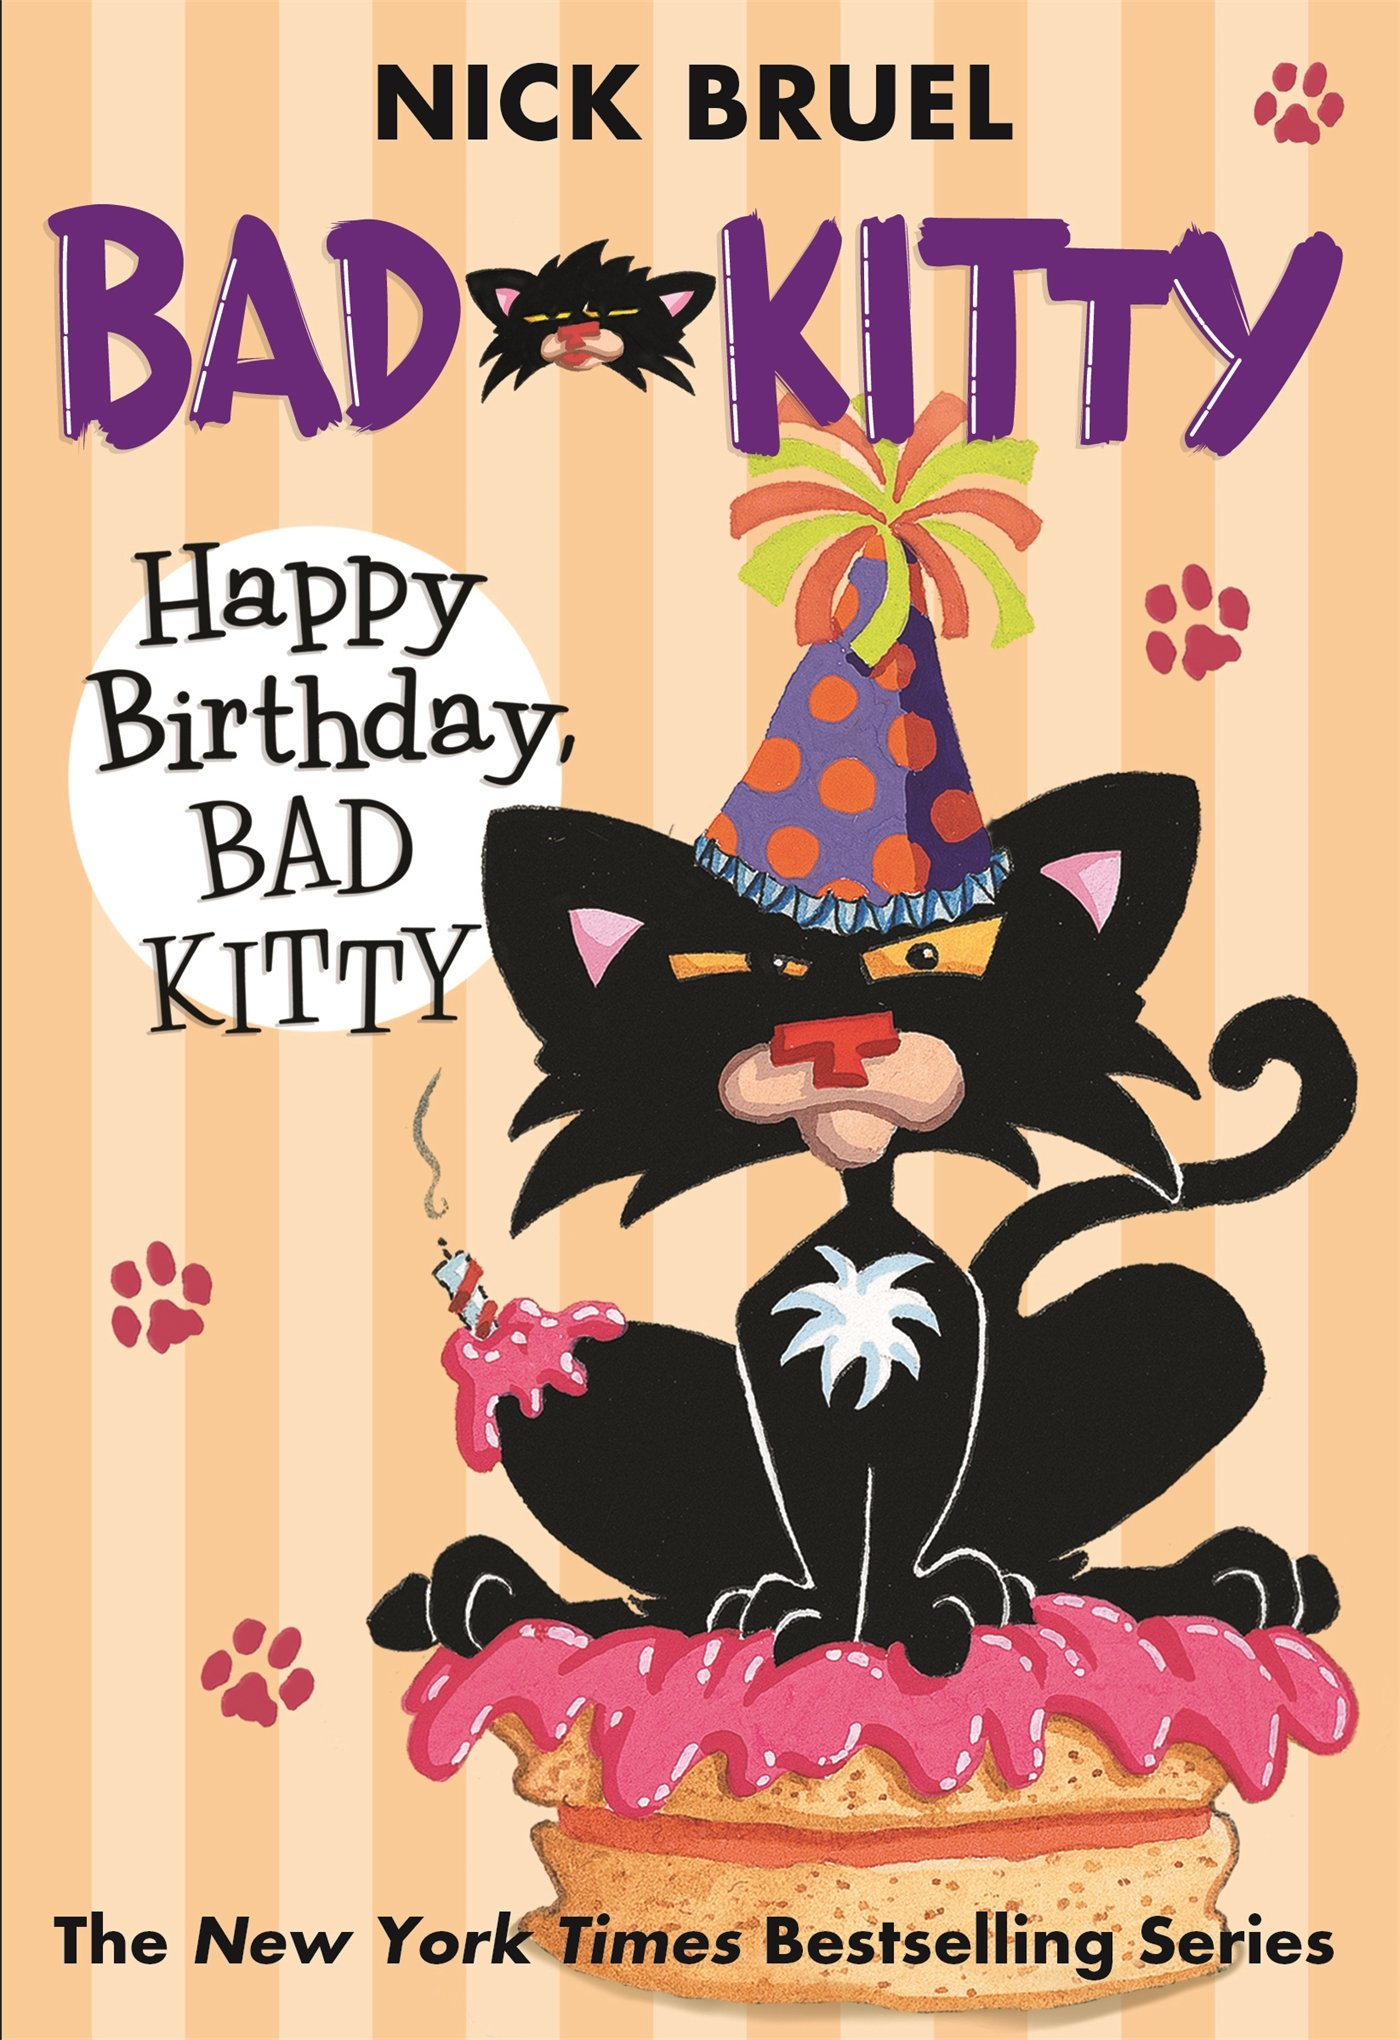 Happy Birthday Kitty Nick Bruel product image